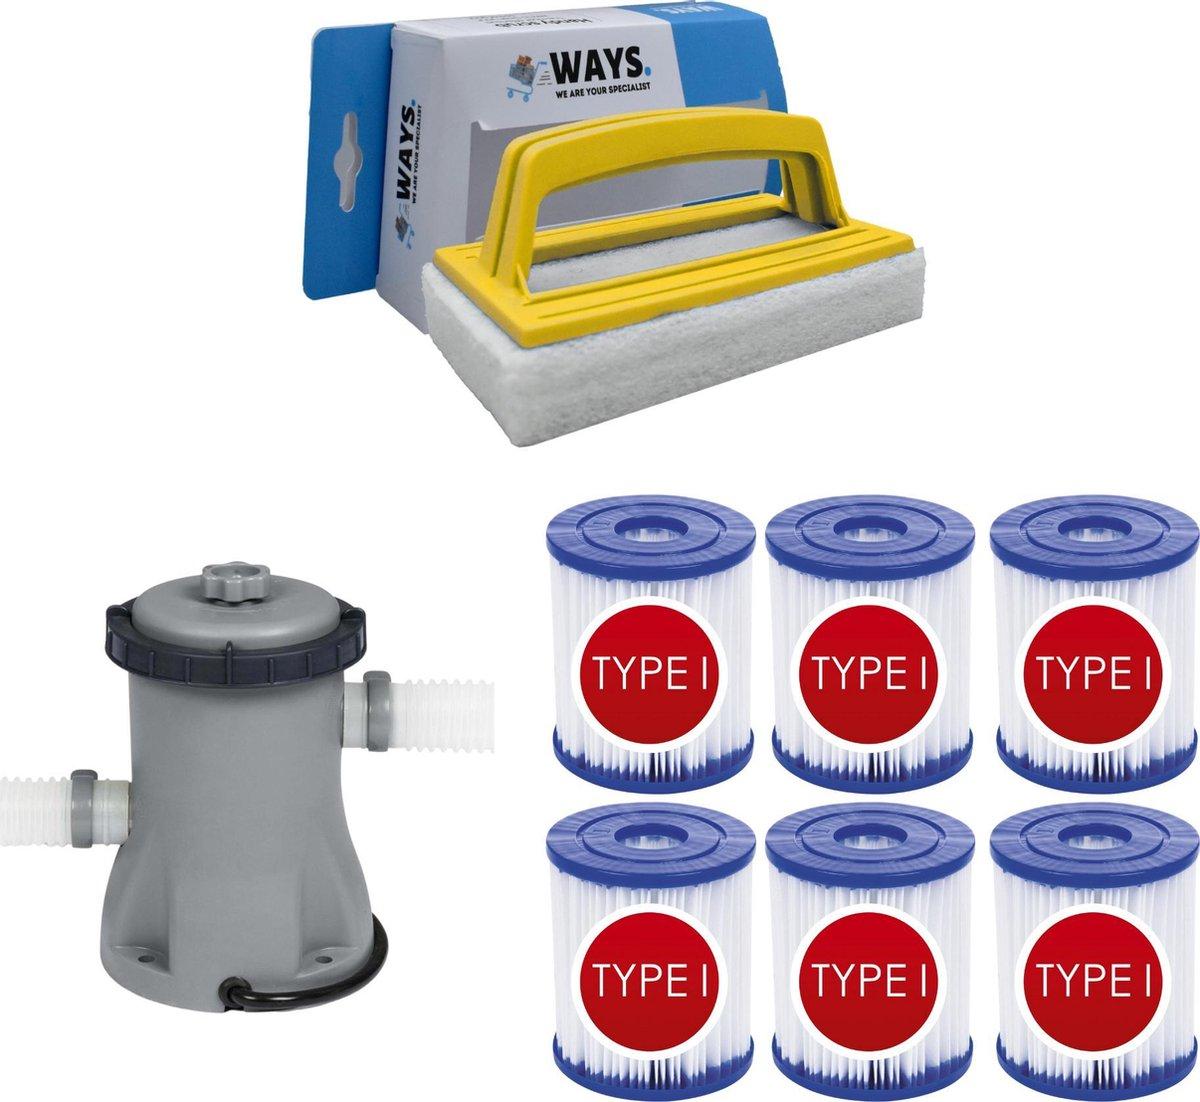 WAYS - Zwembad Onderhoud - Bestway Filterpomp 1249 L/h & 6 Bestway Filters Type I